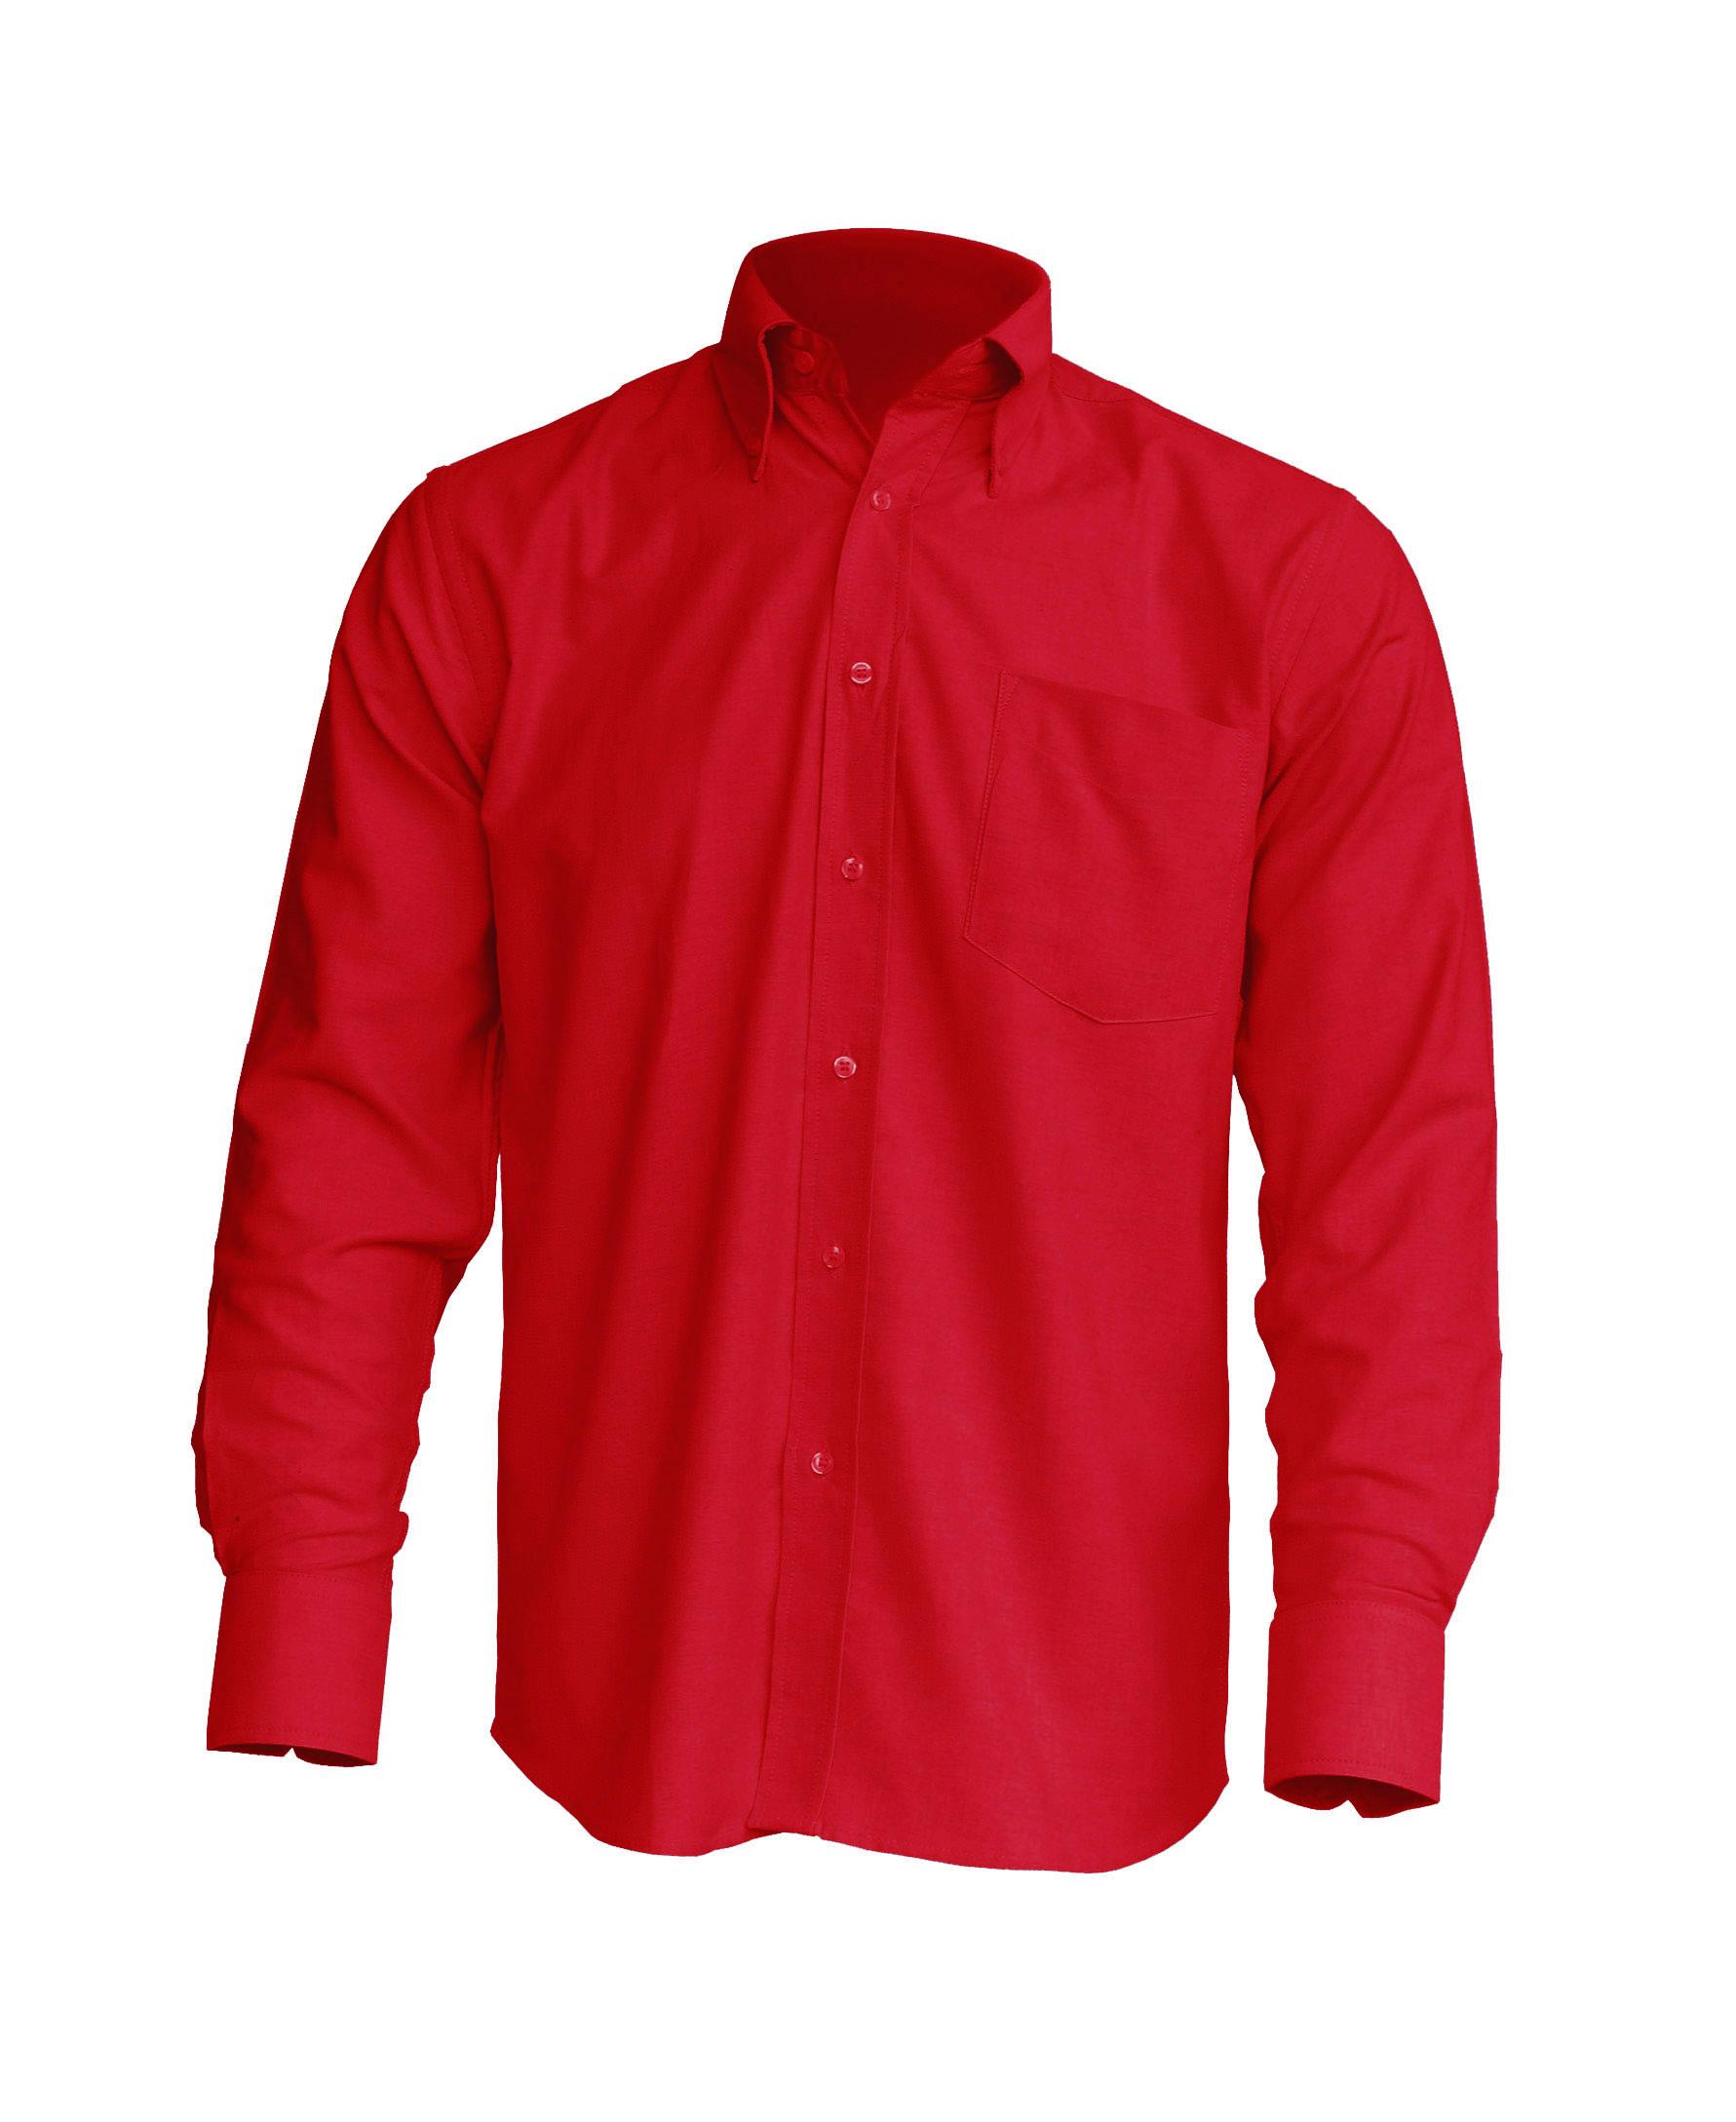 Shirt Poplin Red